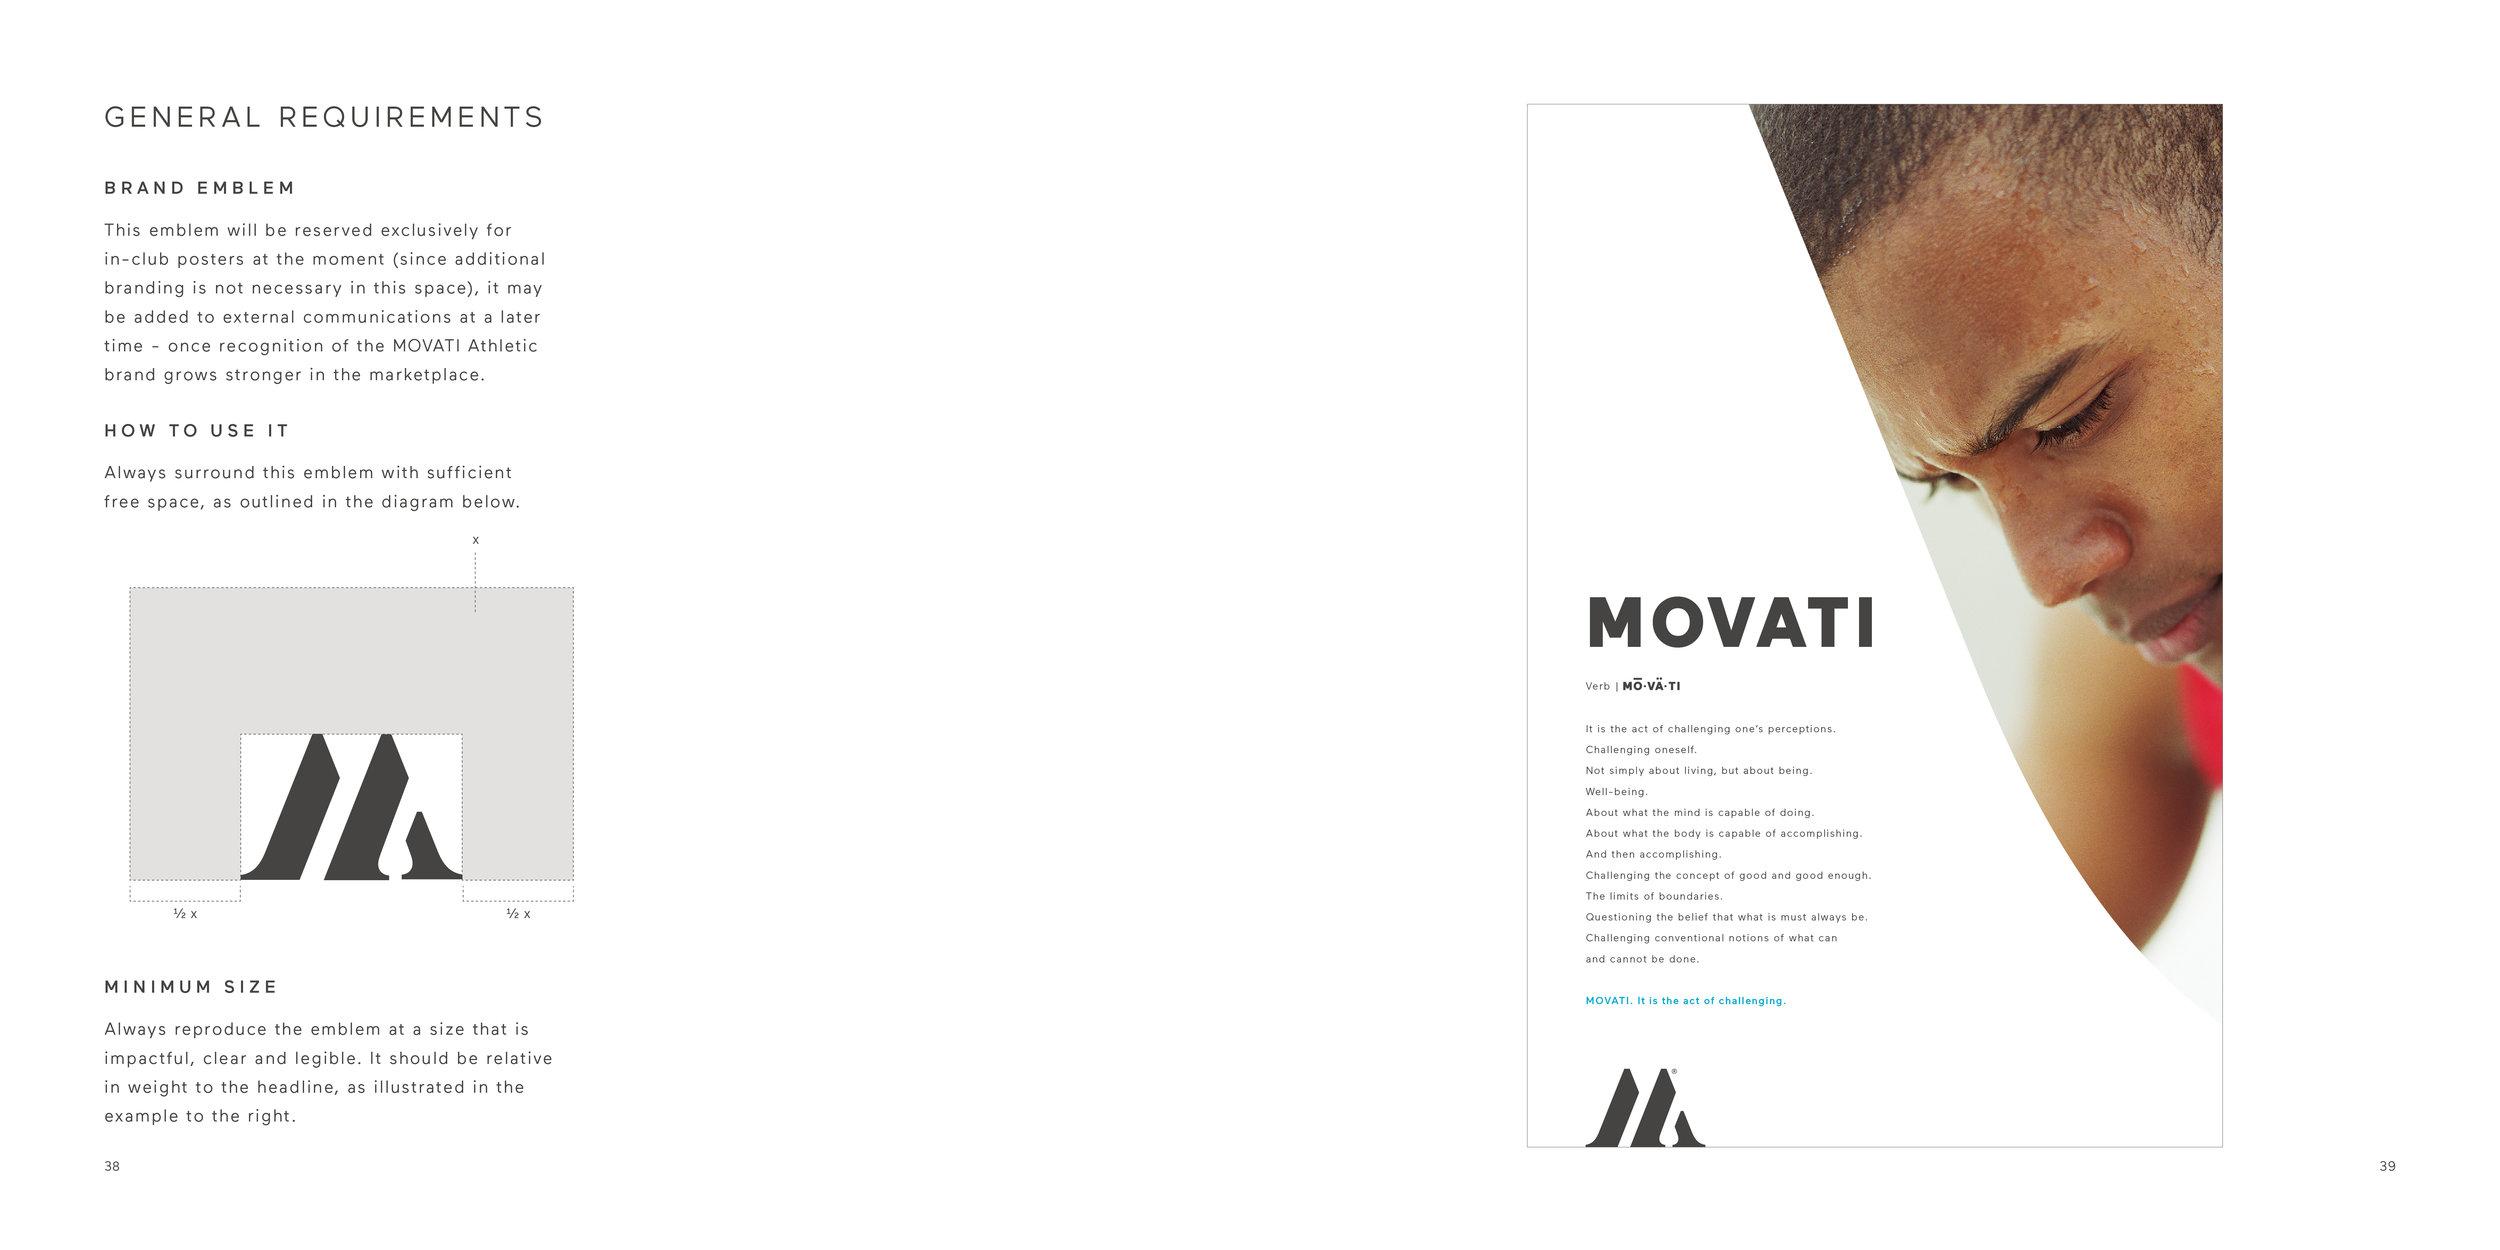 Movati_BrandGuidelines20.jpg